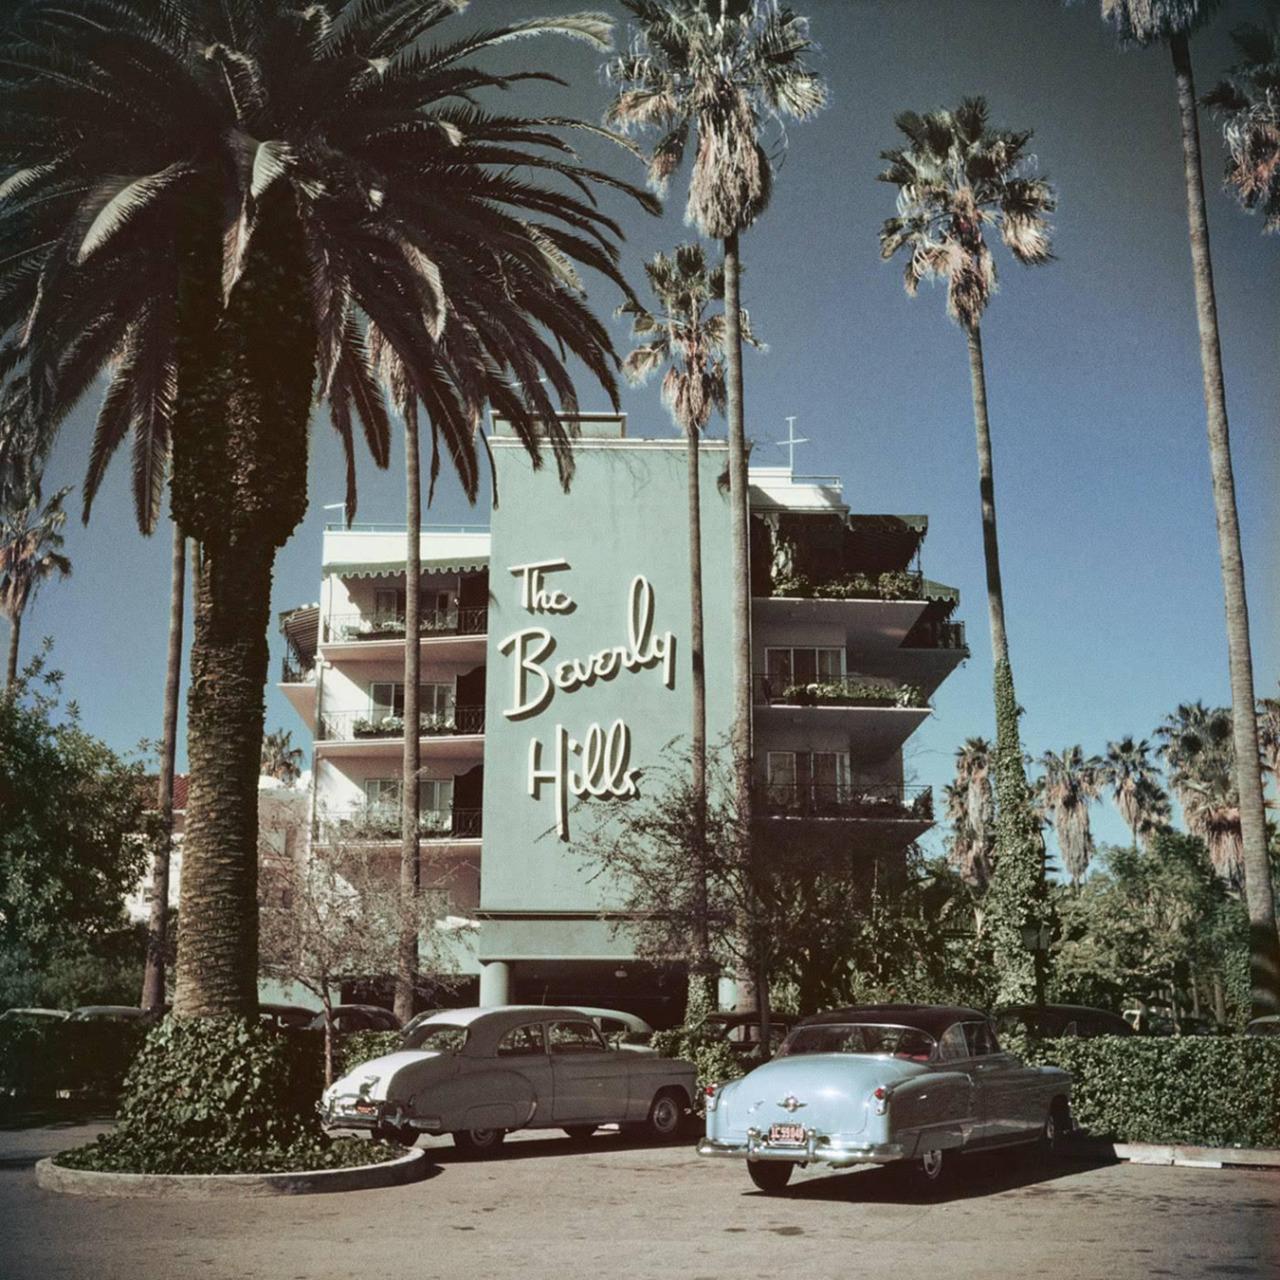 The Beverly Hills Hotel - 9641 Sunset Boulevard, Beverly Hills, California U.S.A. - 1957